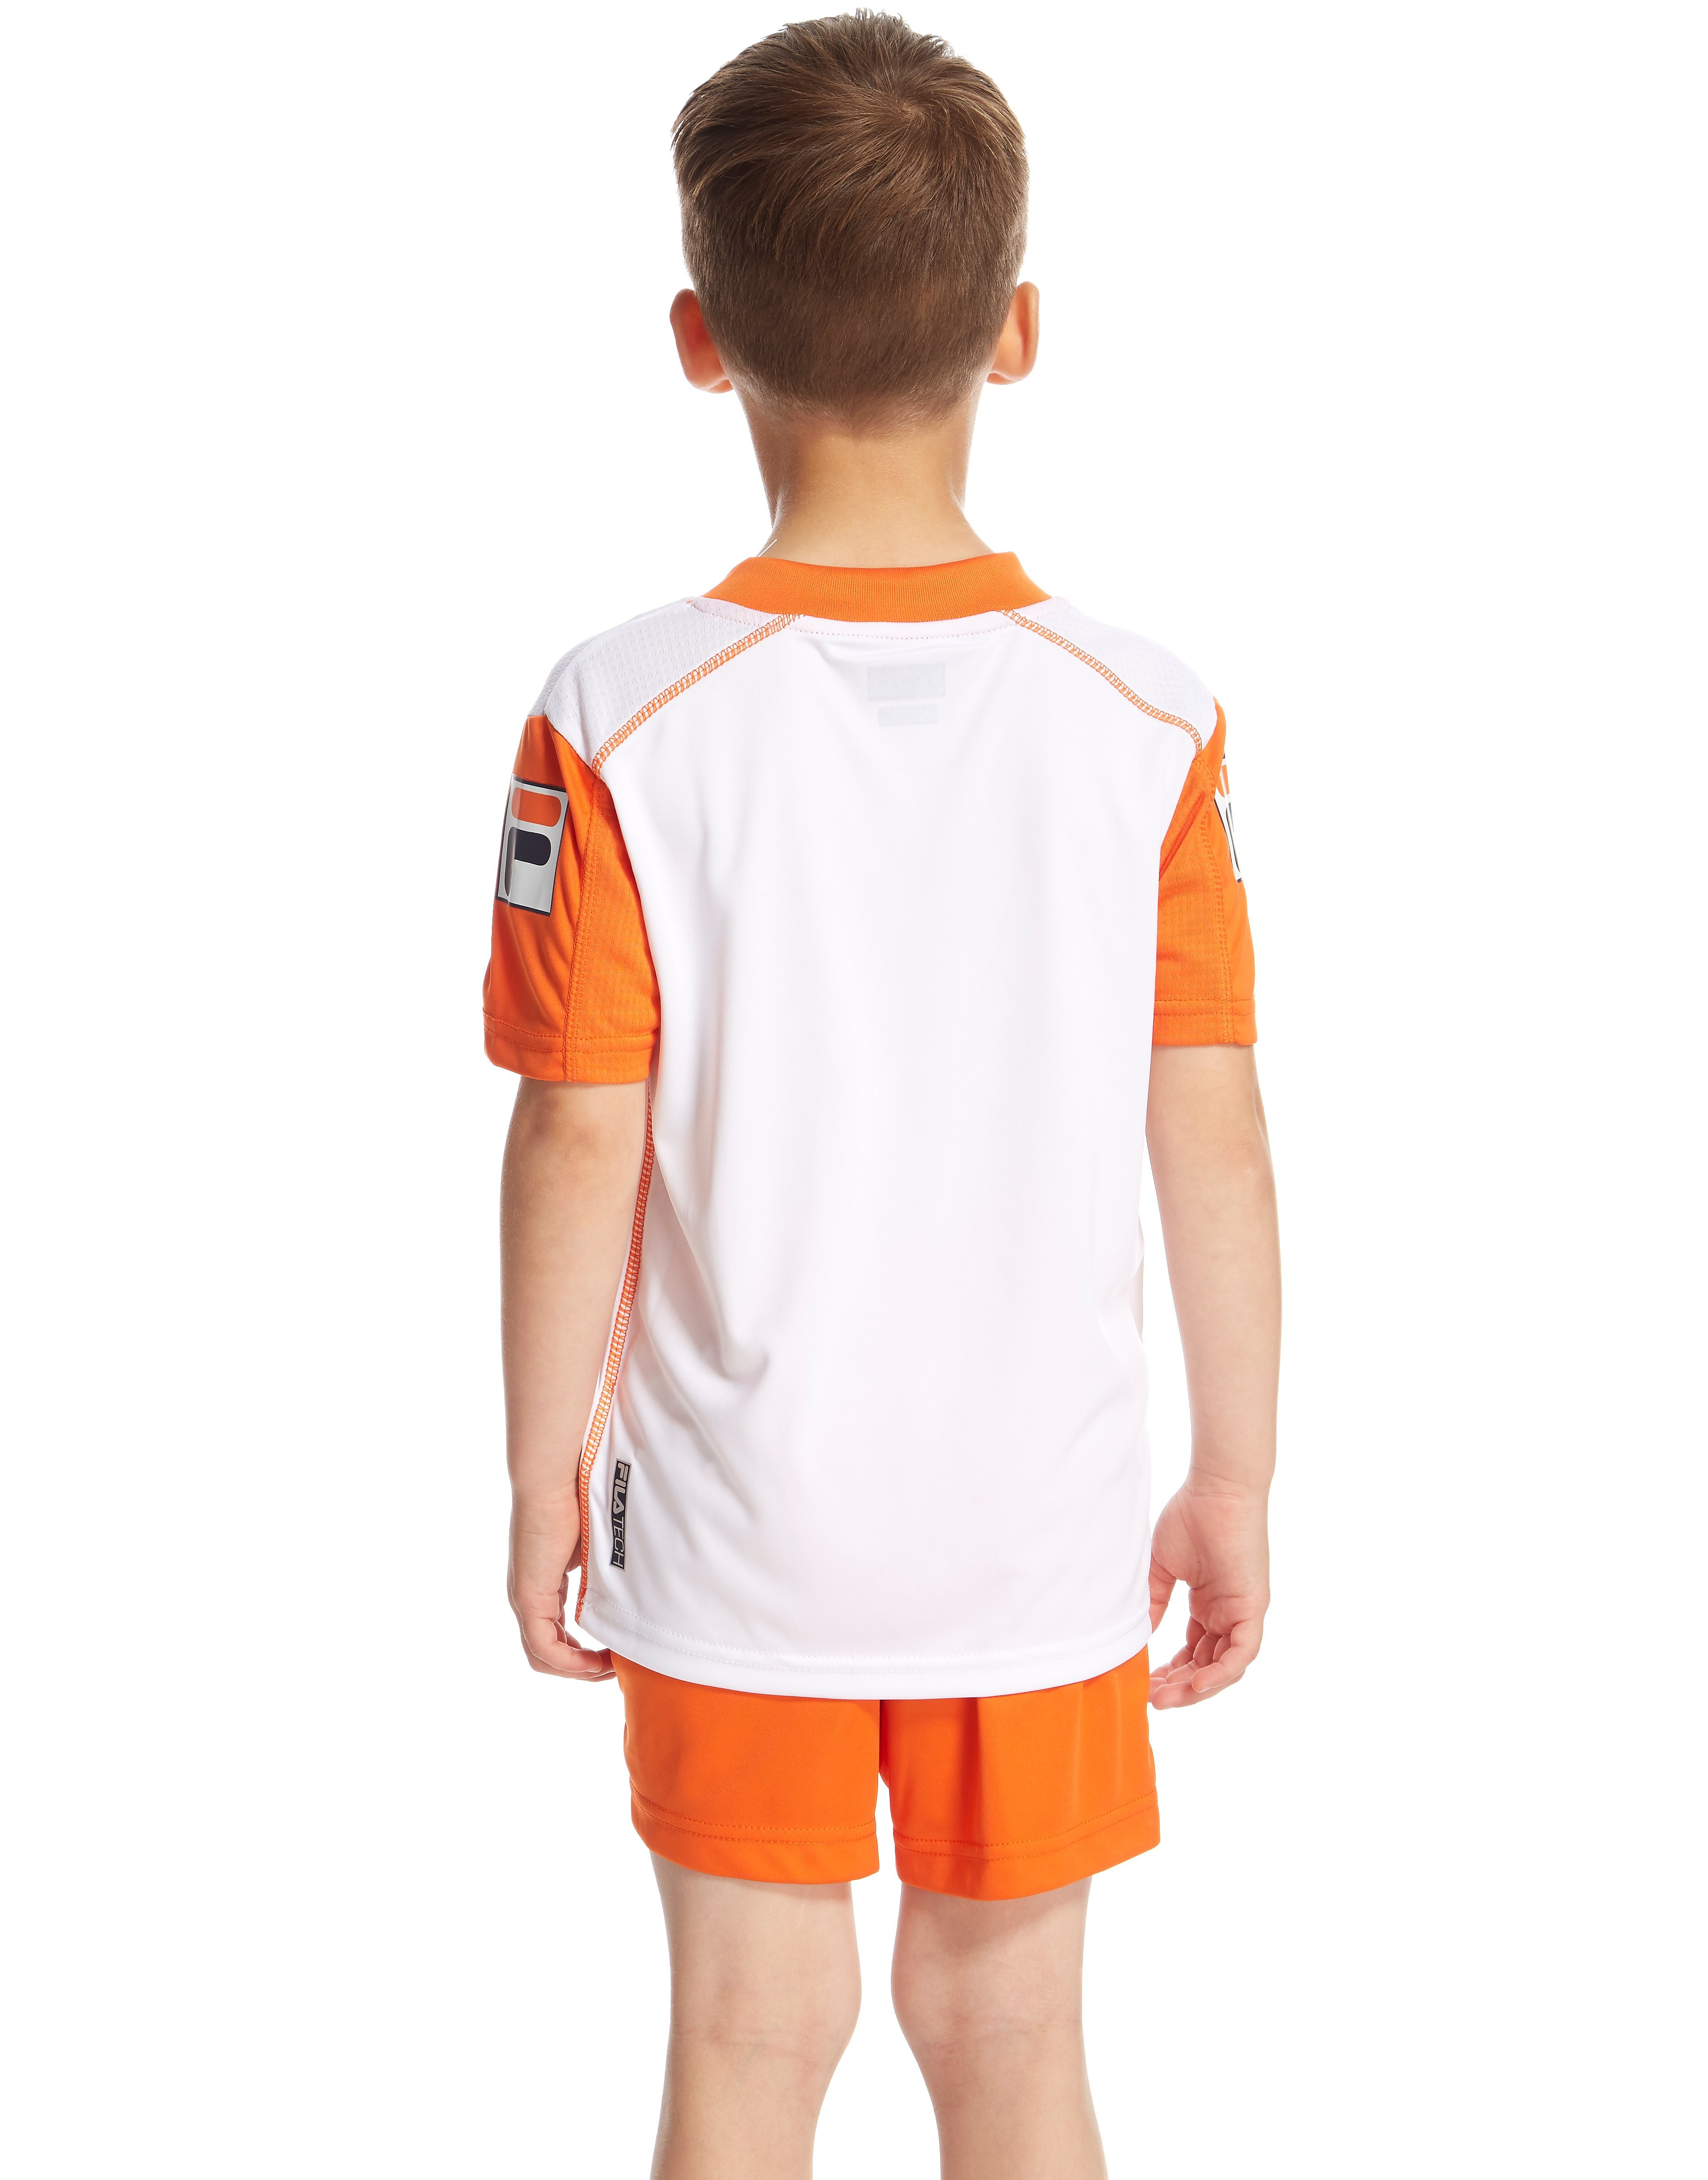 Fila Luton Town FC Away 2015/16 Kit Children